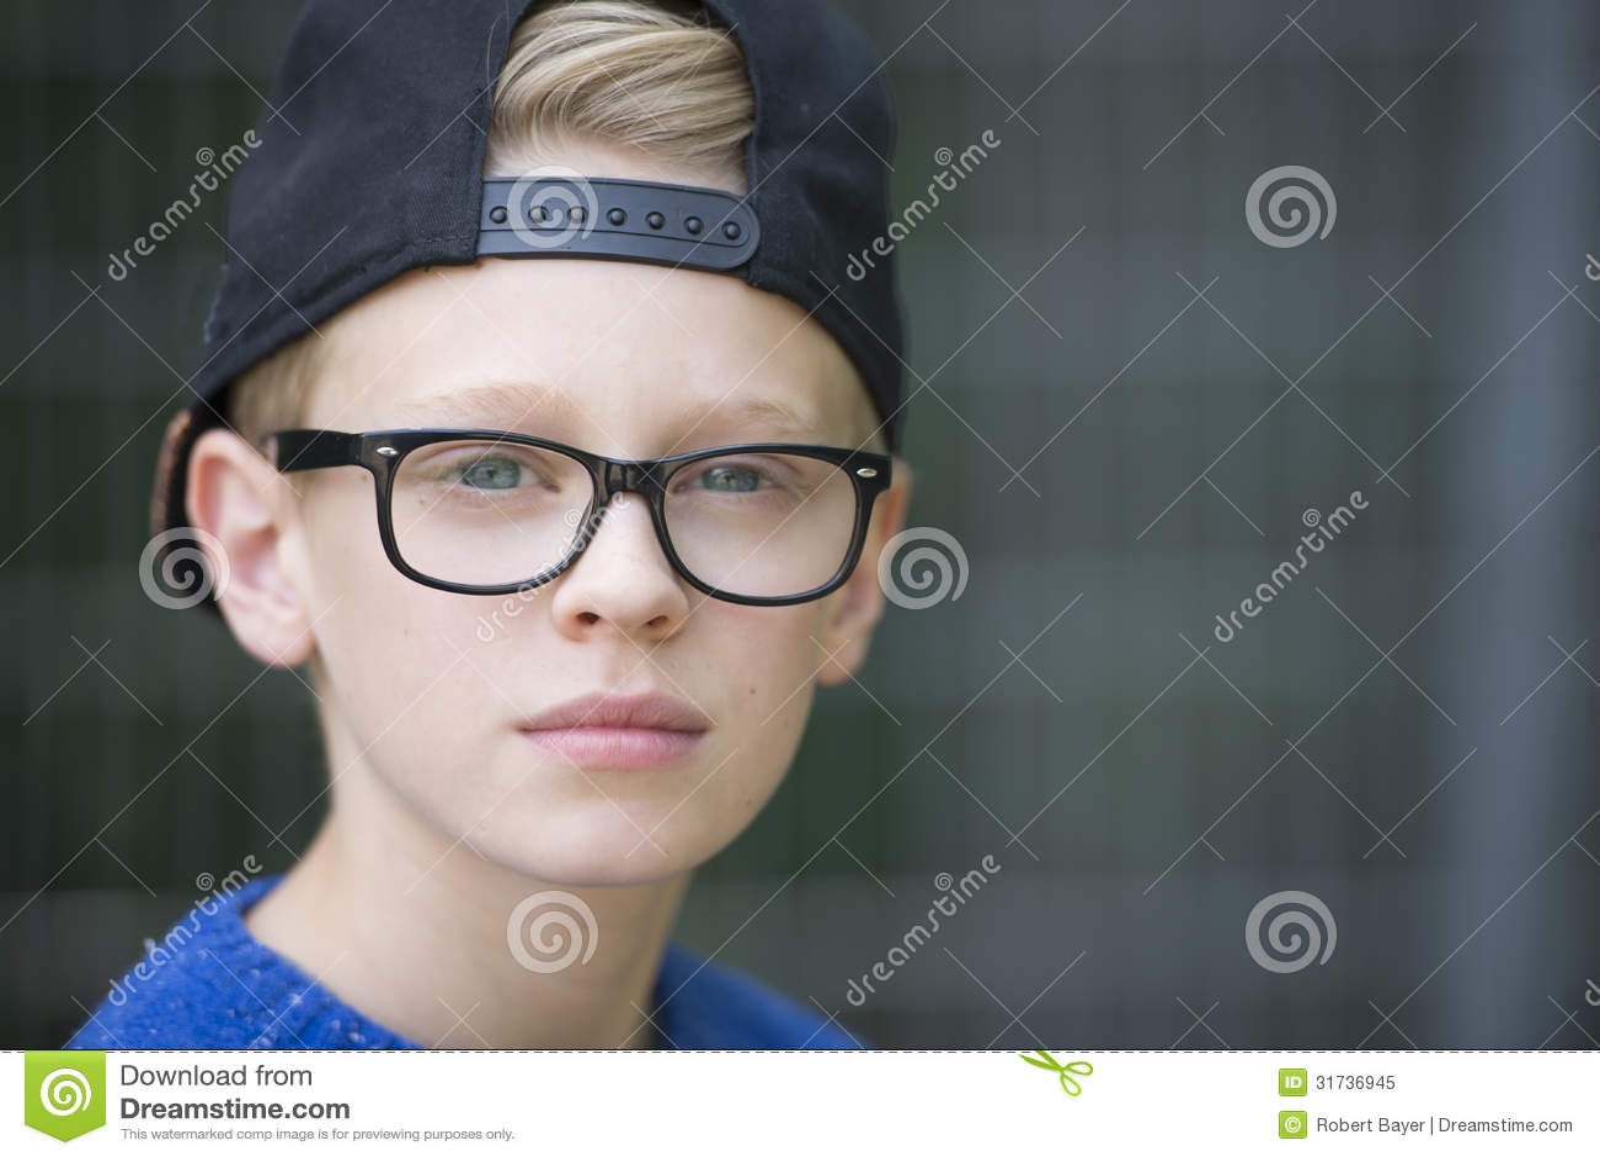 48c7cad64c2e Portrait Confident Teenage Boy With Cap Stock Image - Image of ...